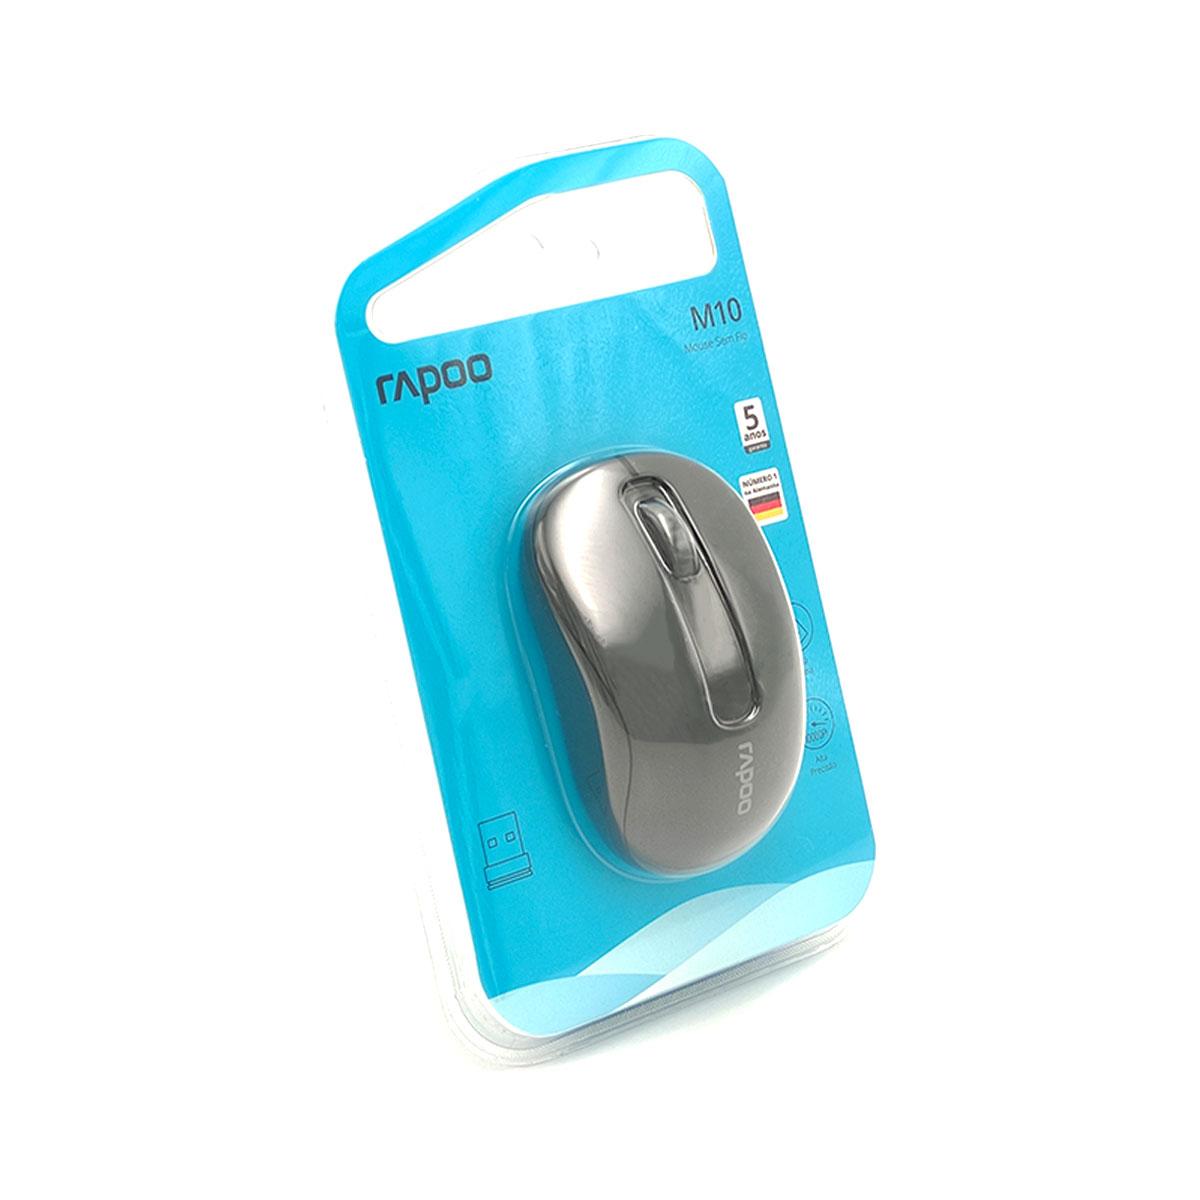 Mouse Rapoo M10 Plus, Wireless 2.4 GHz, 1000 DPI, Preto - RA007